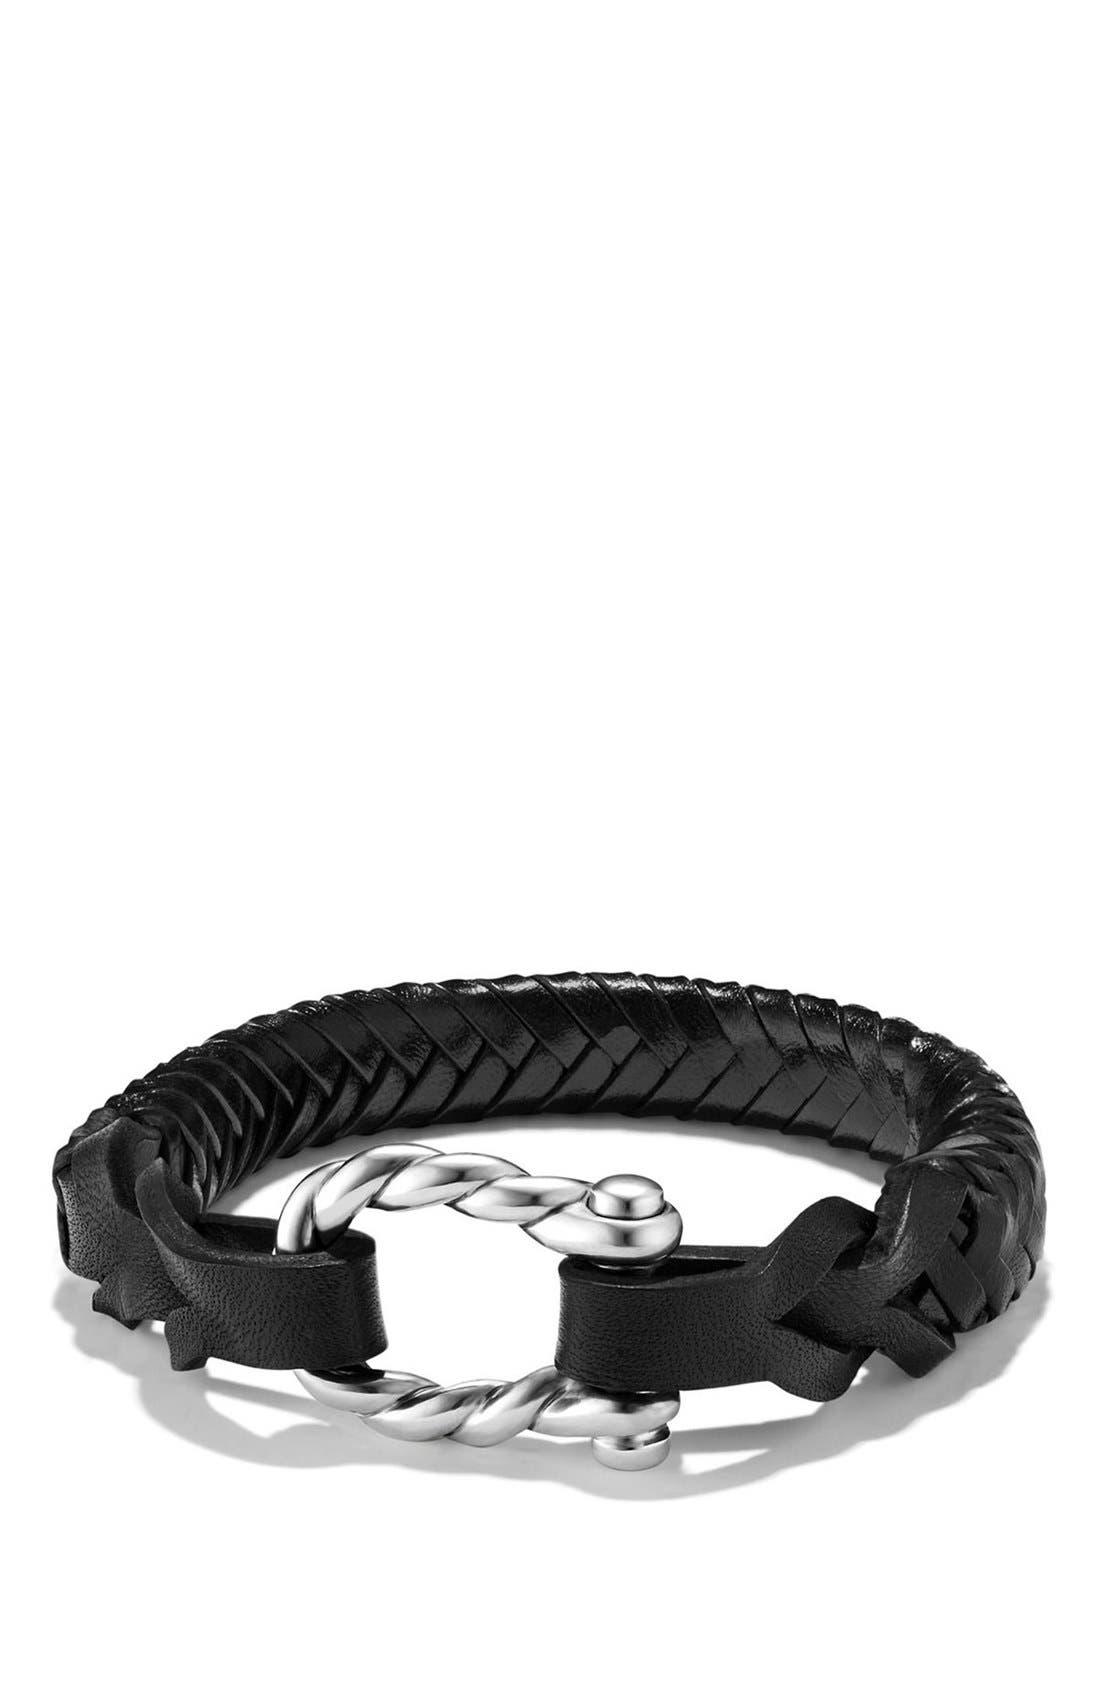 Main Image - David Yurman 'Maritime' Leather Woven Shackle Bracelet